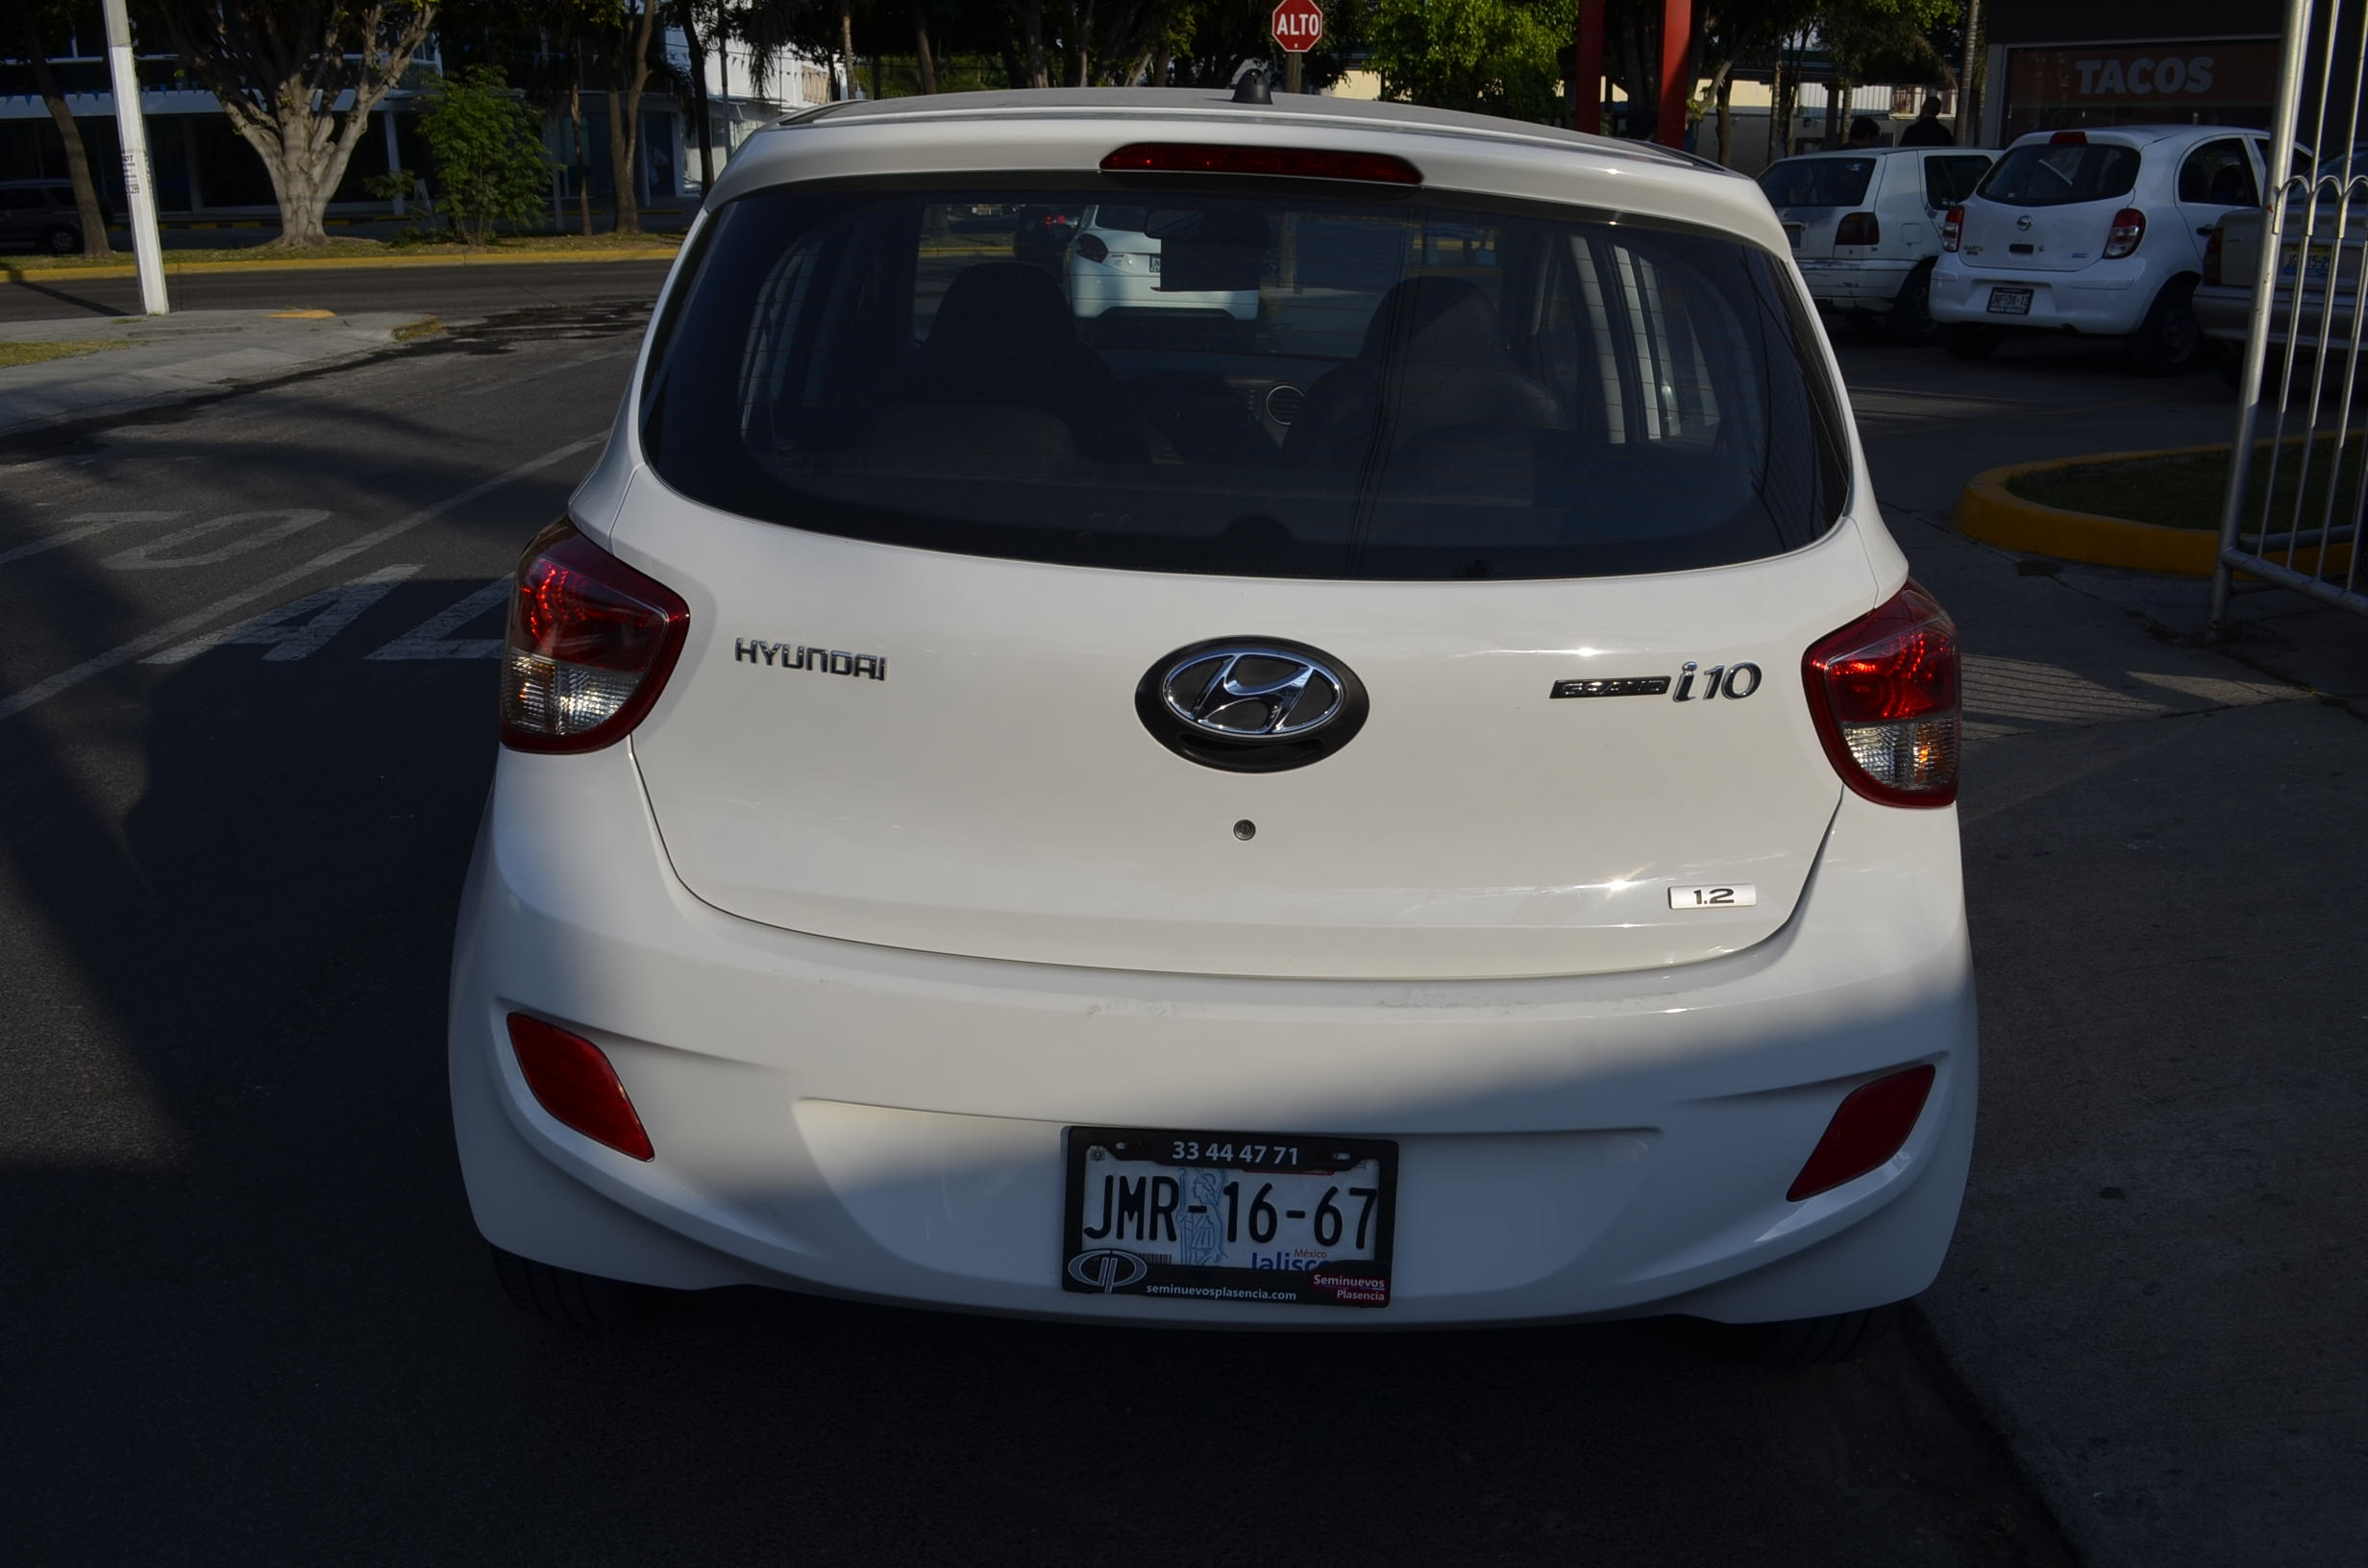 Hyundai Grand i10 Llantas 3